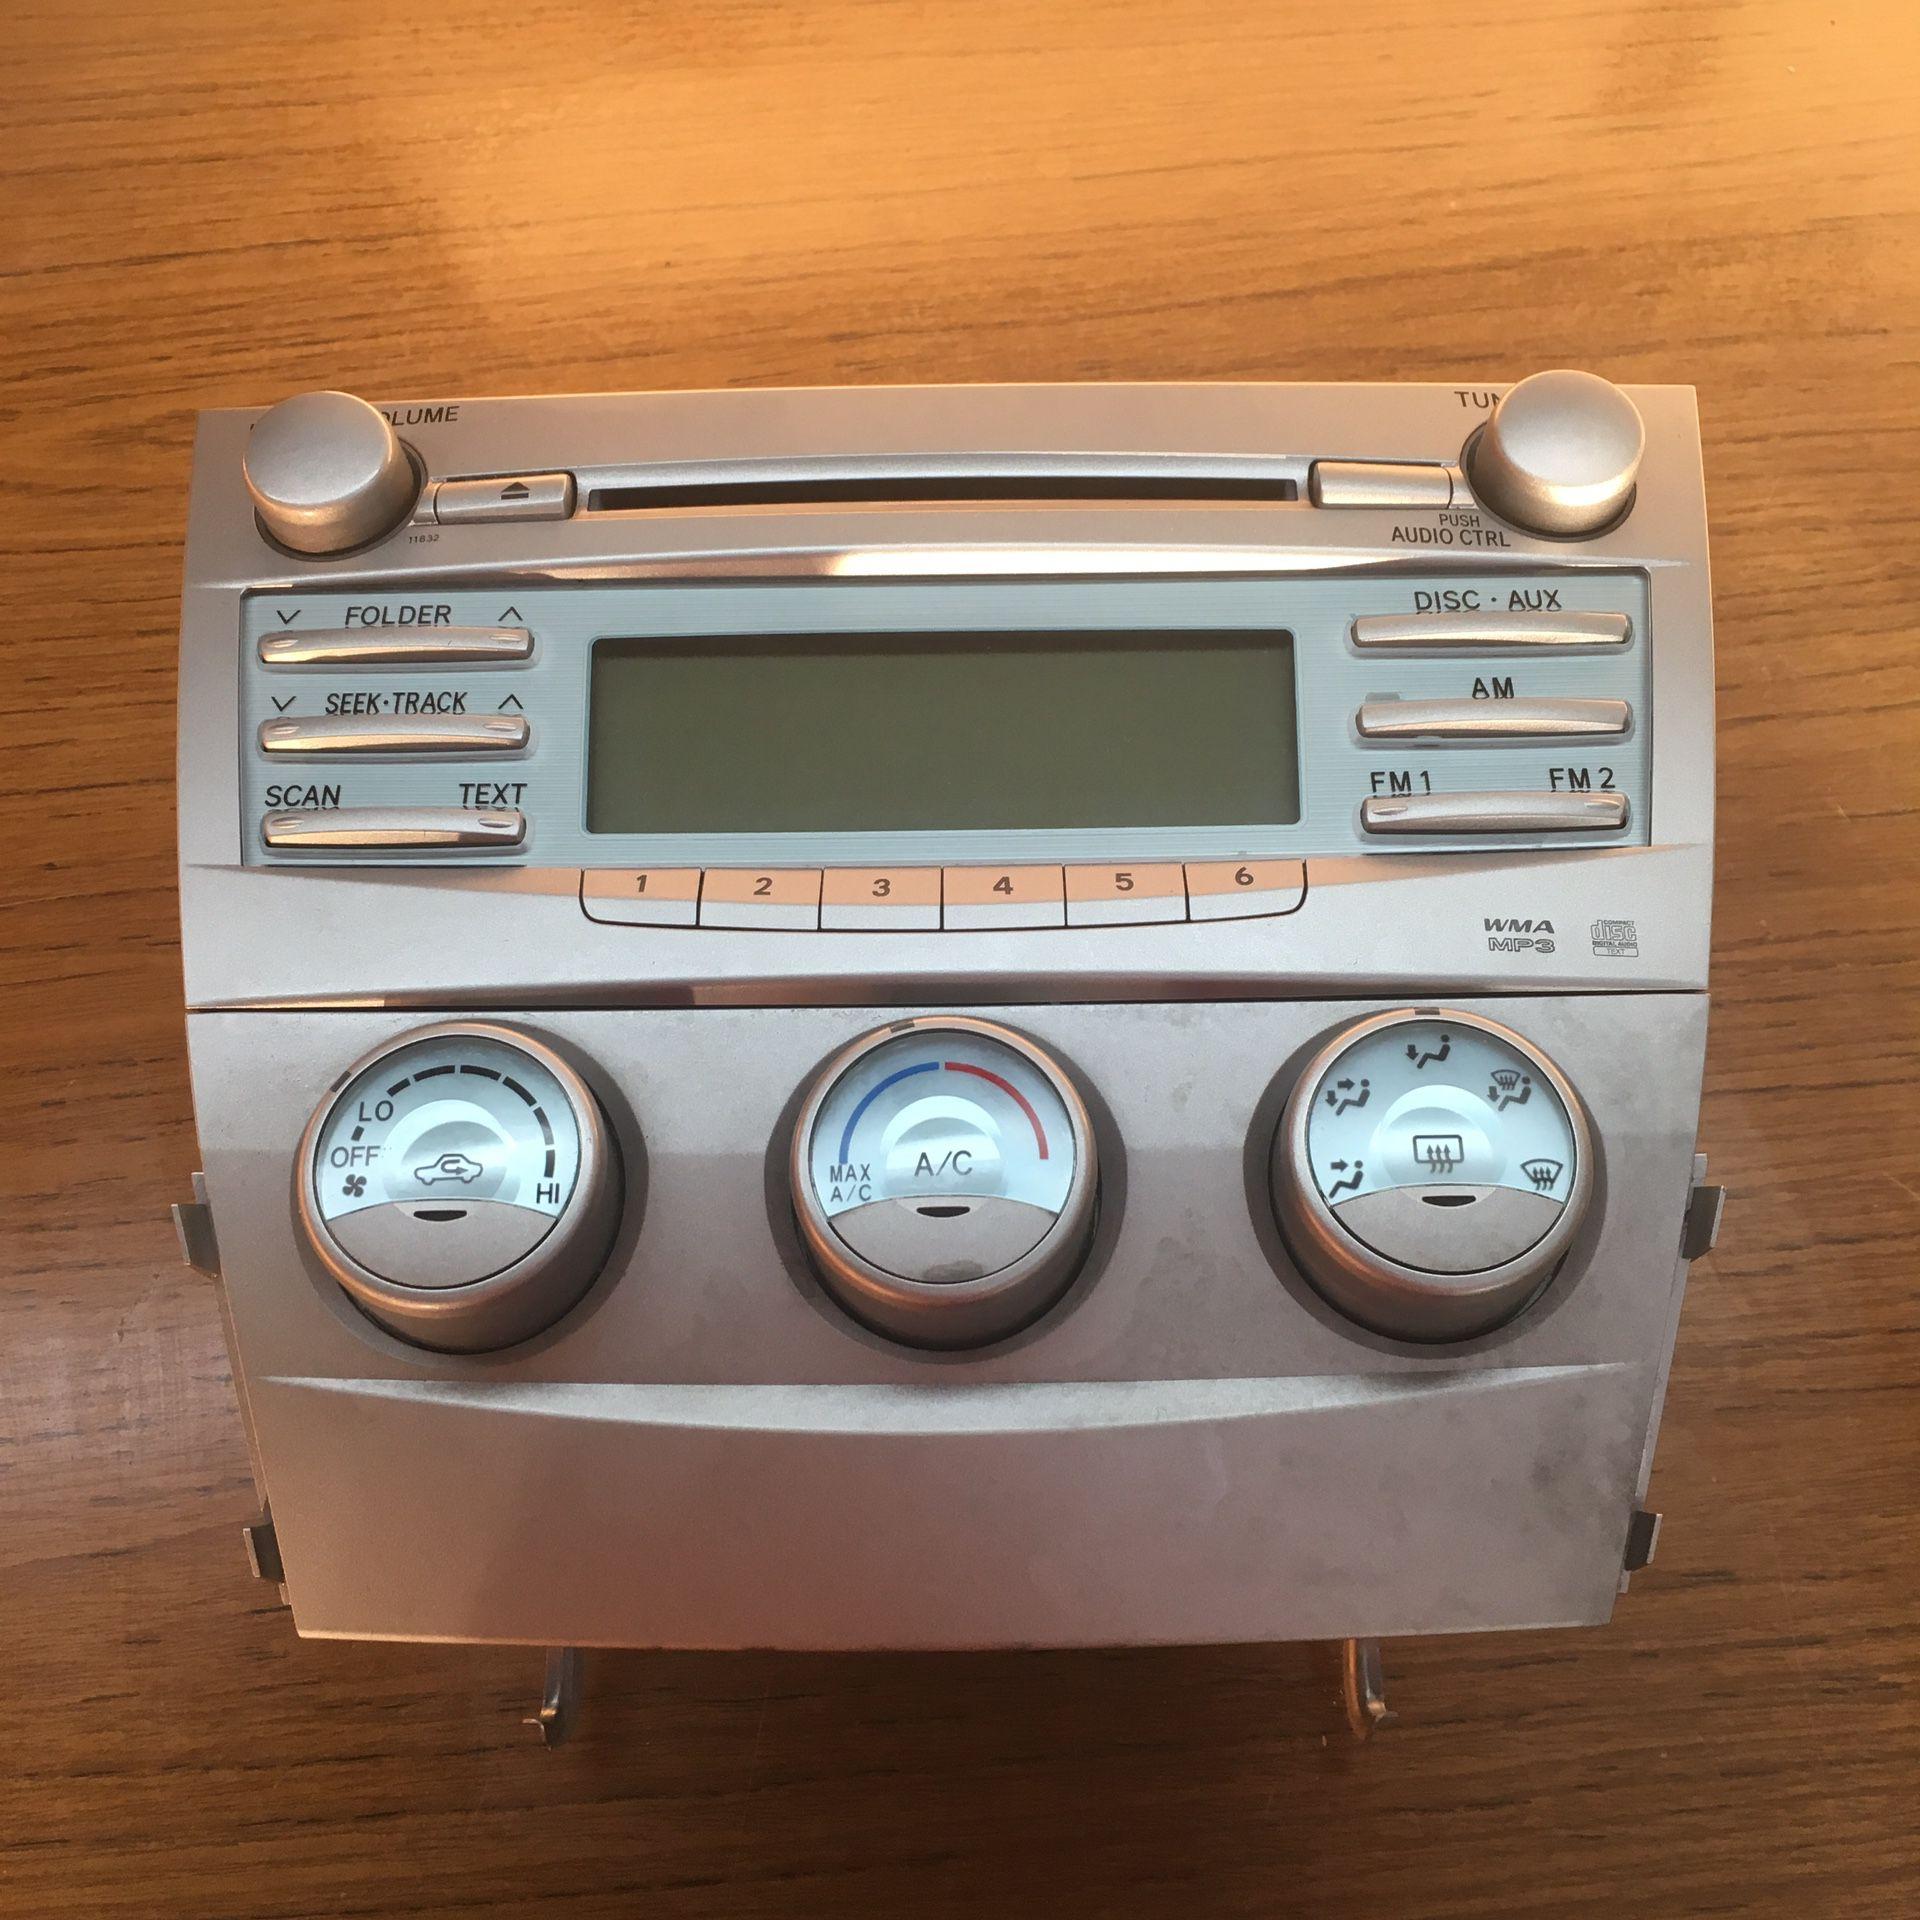 2007-2011 Toyota Camry Radio system